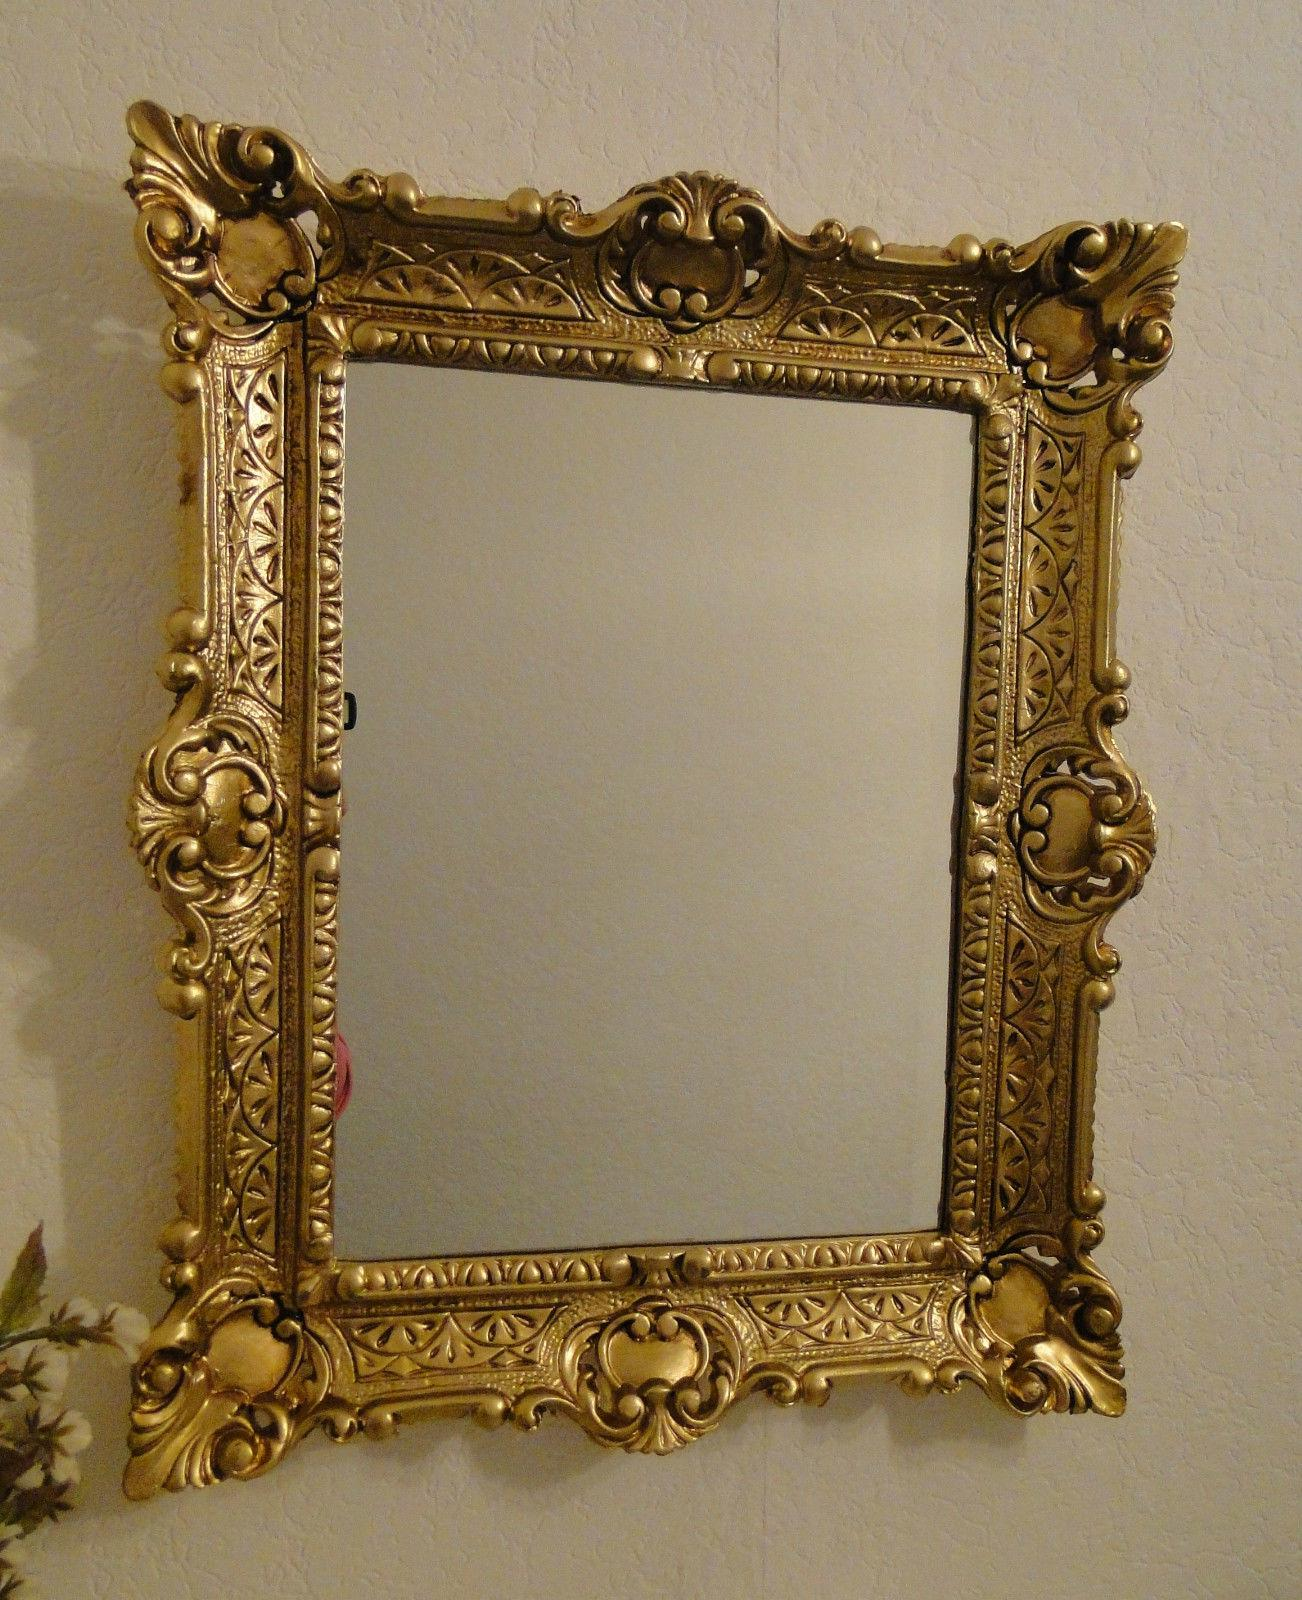 vintage wandspiegel antik spiegel barock 57x47 bad spiegel gold rechteckig kaufen bei pintici. Black Bedroom Furniture Sets. Home Design Ideas